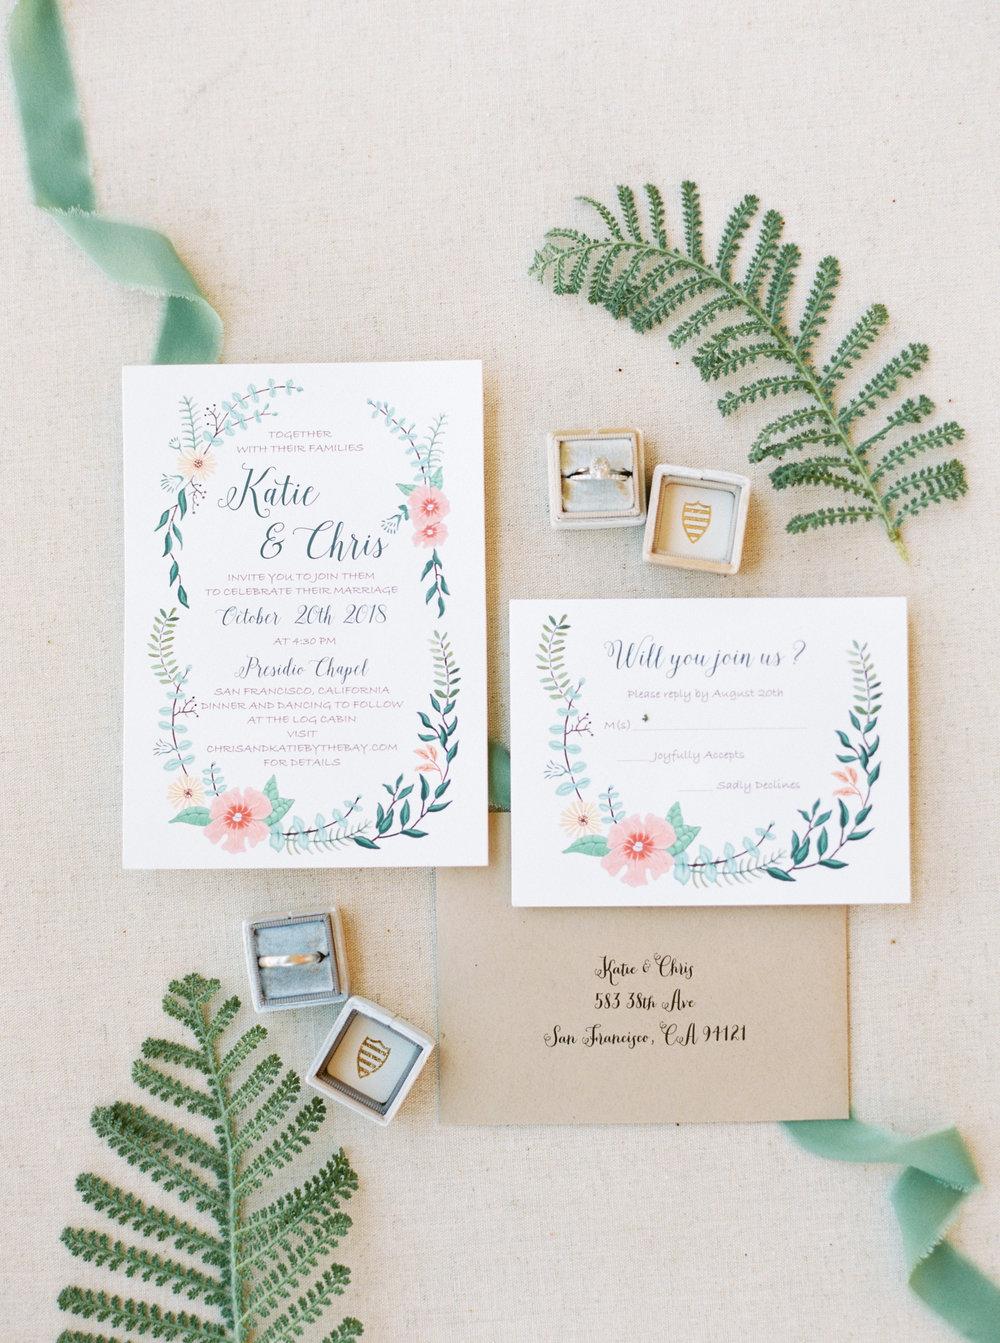 Log-cabin-wedding-in-presidio-san-francisco-california-desintation-wedding-photography-7.jpg